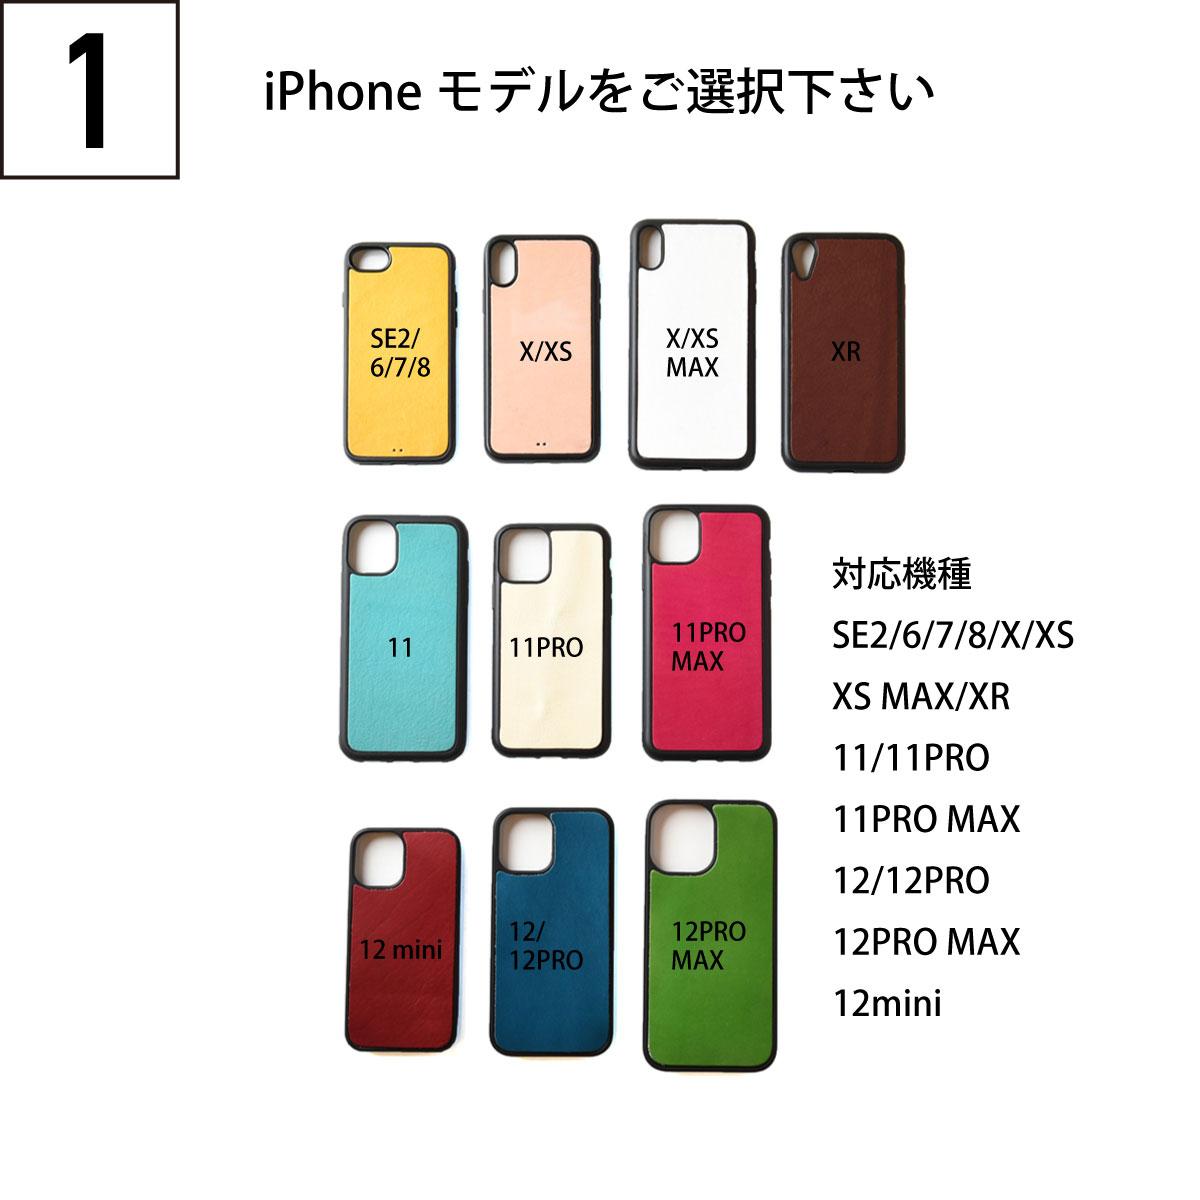 iPhoneOpenCase:   Design J:マーク埋込み/スマイル右上